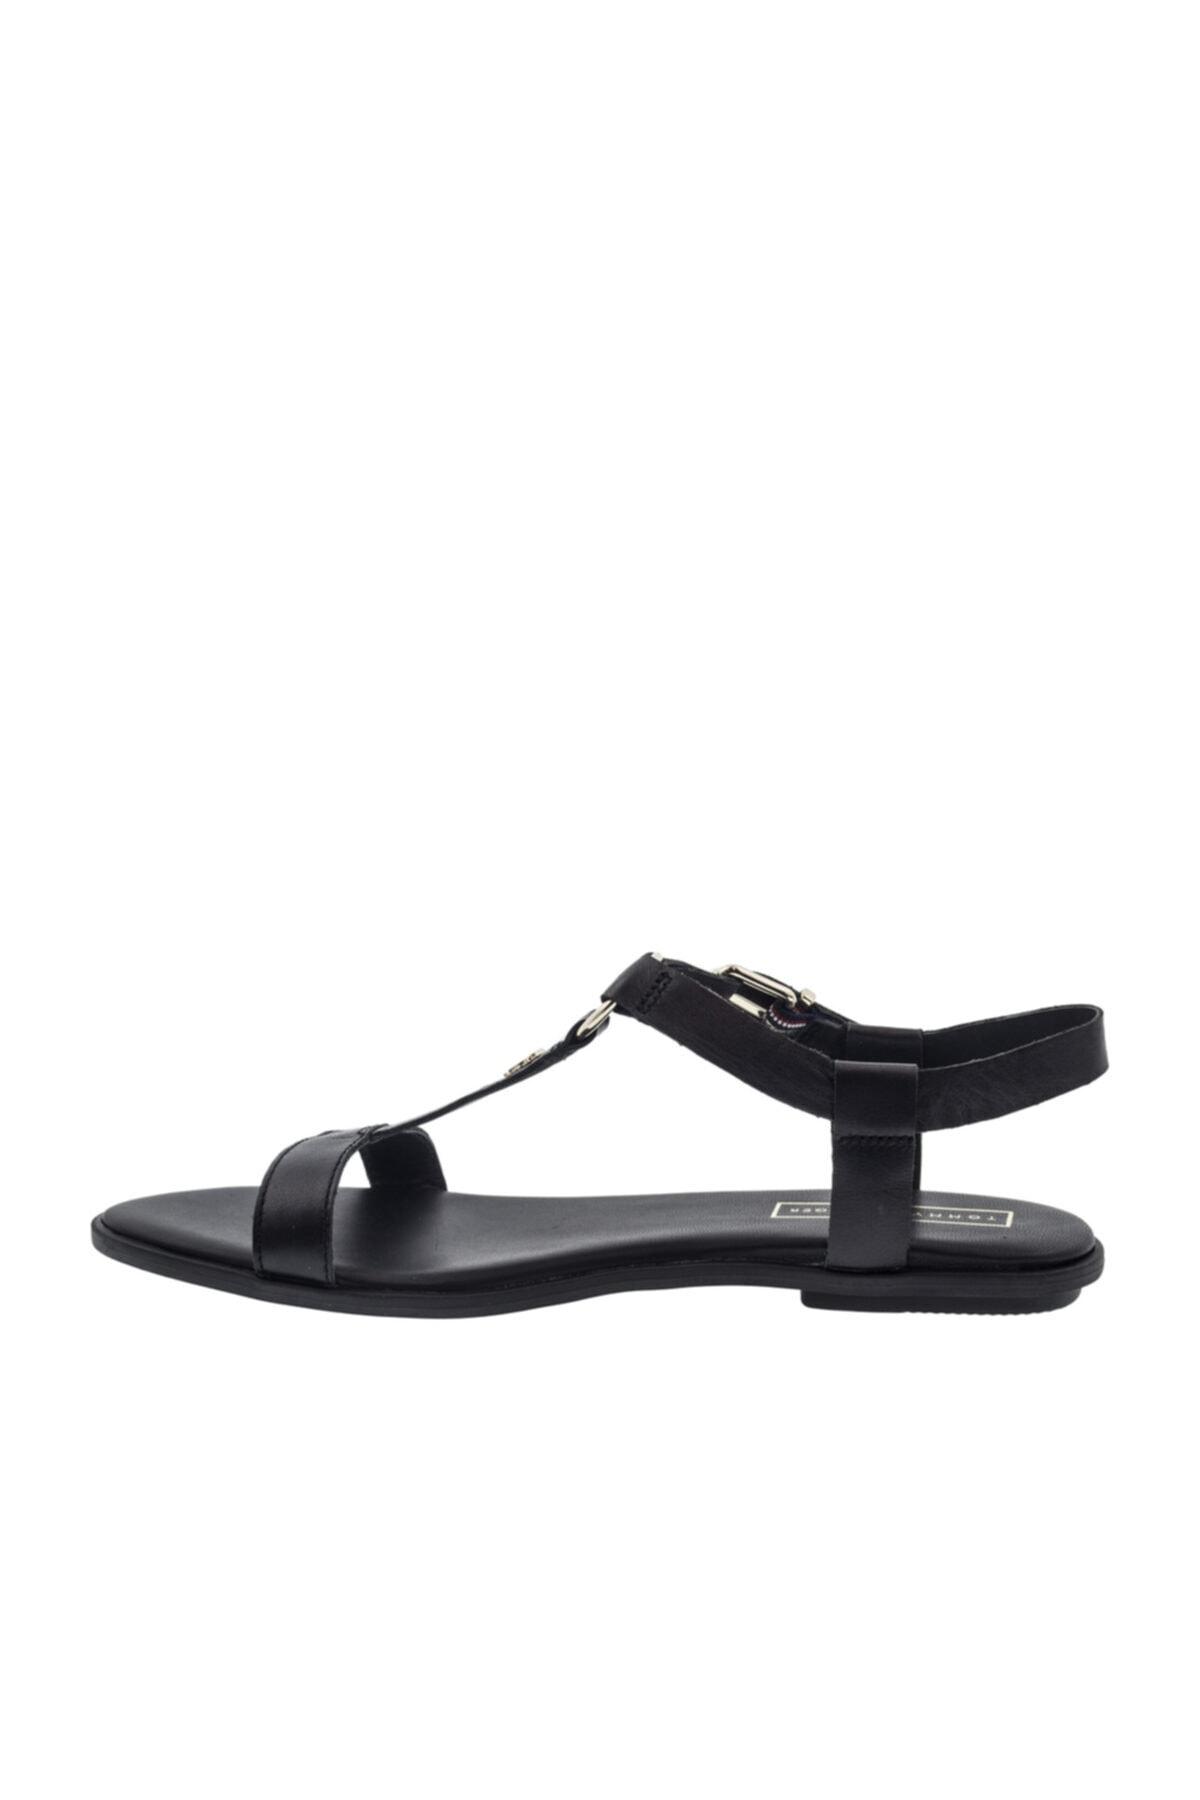 Tommy Hilfiger Kadın Siyah Düz Taban Sandalet (fw0fw0 2